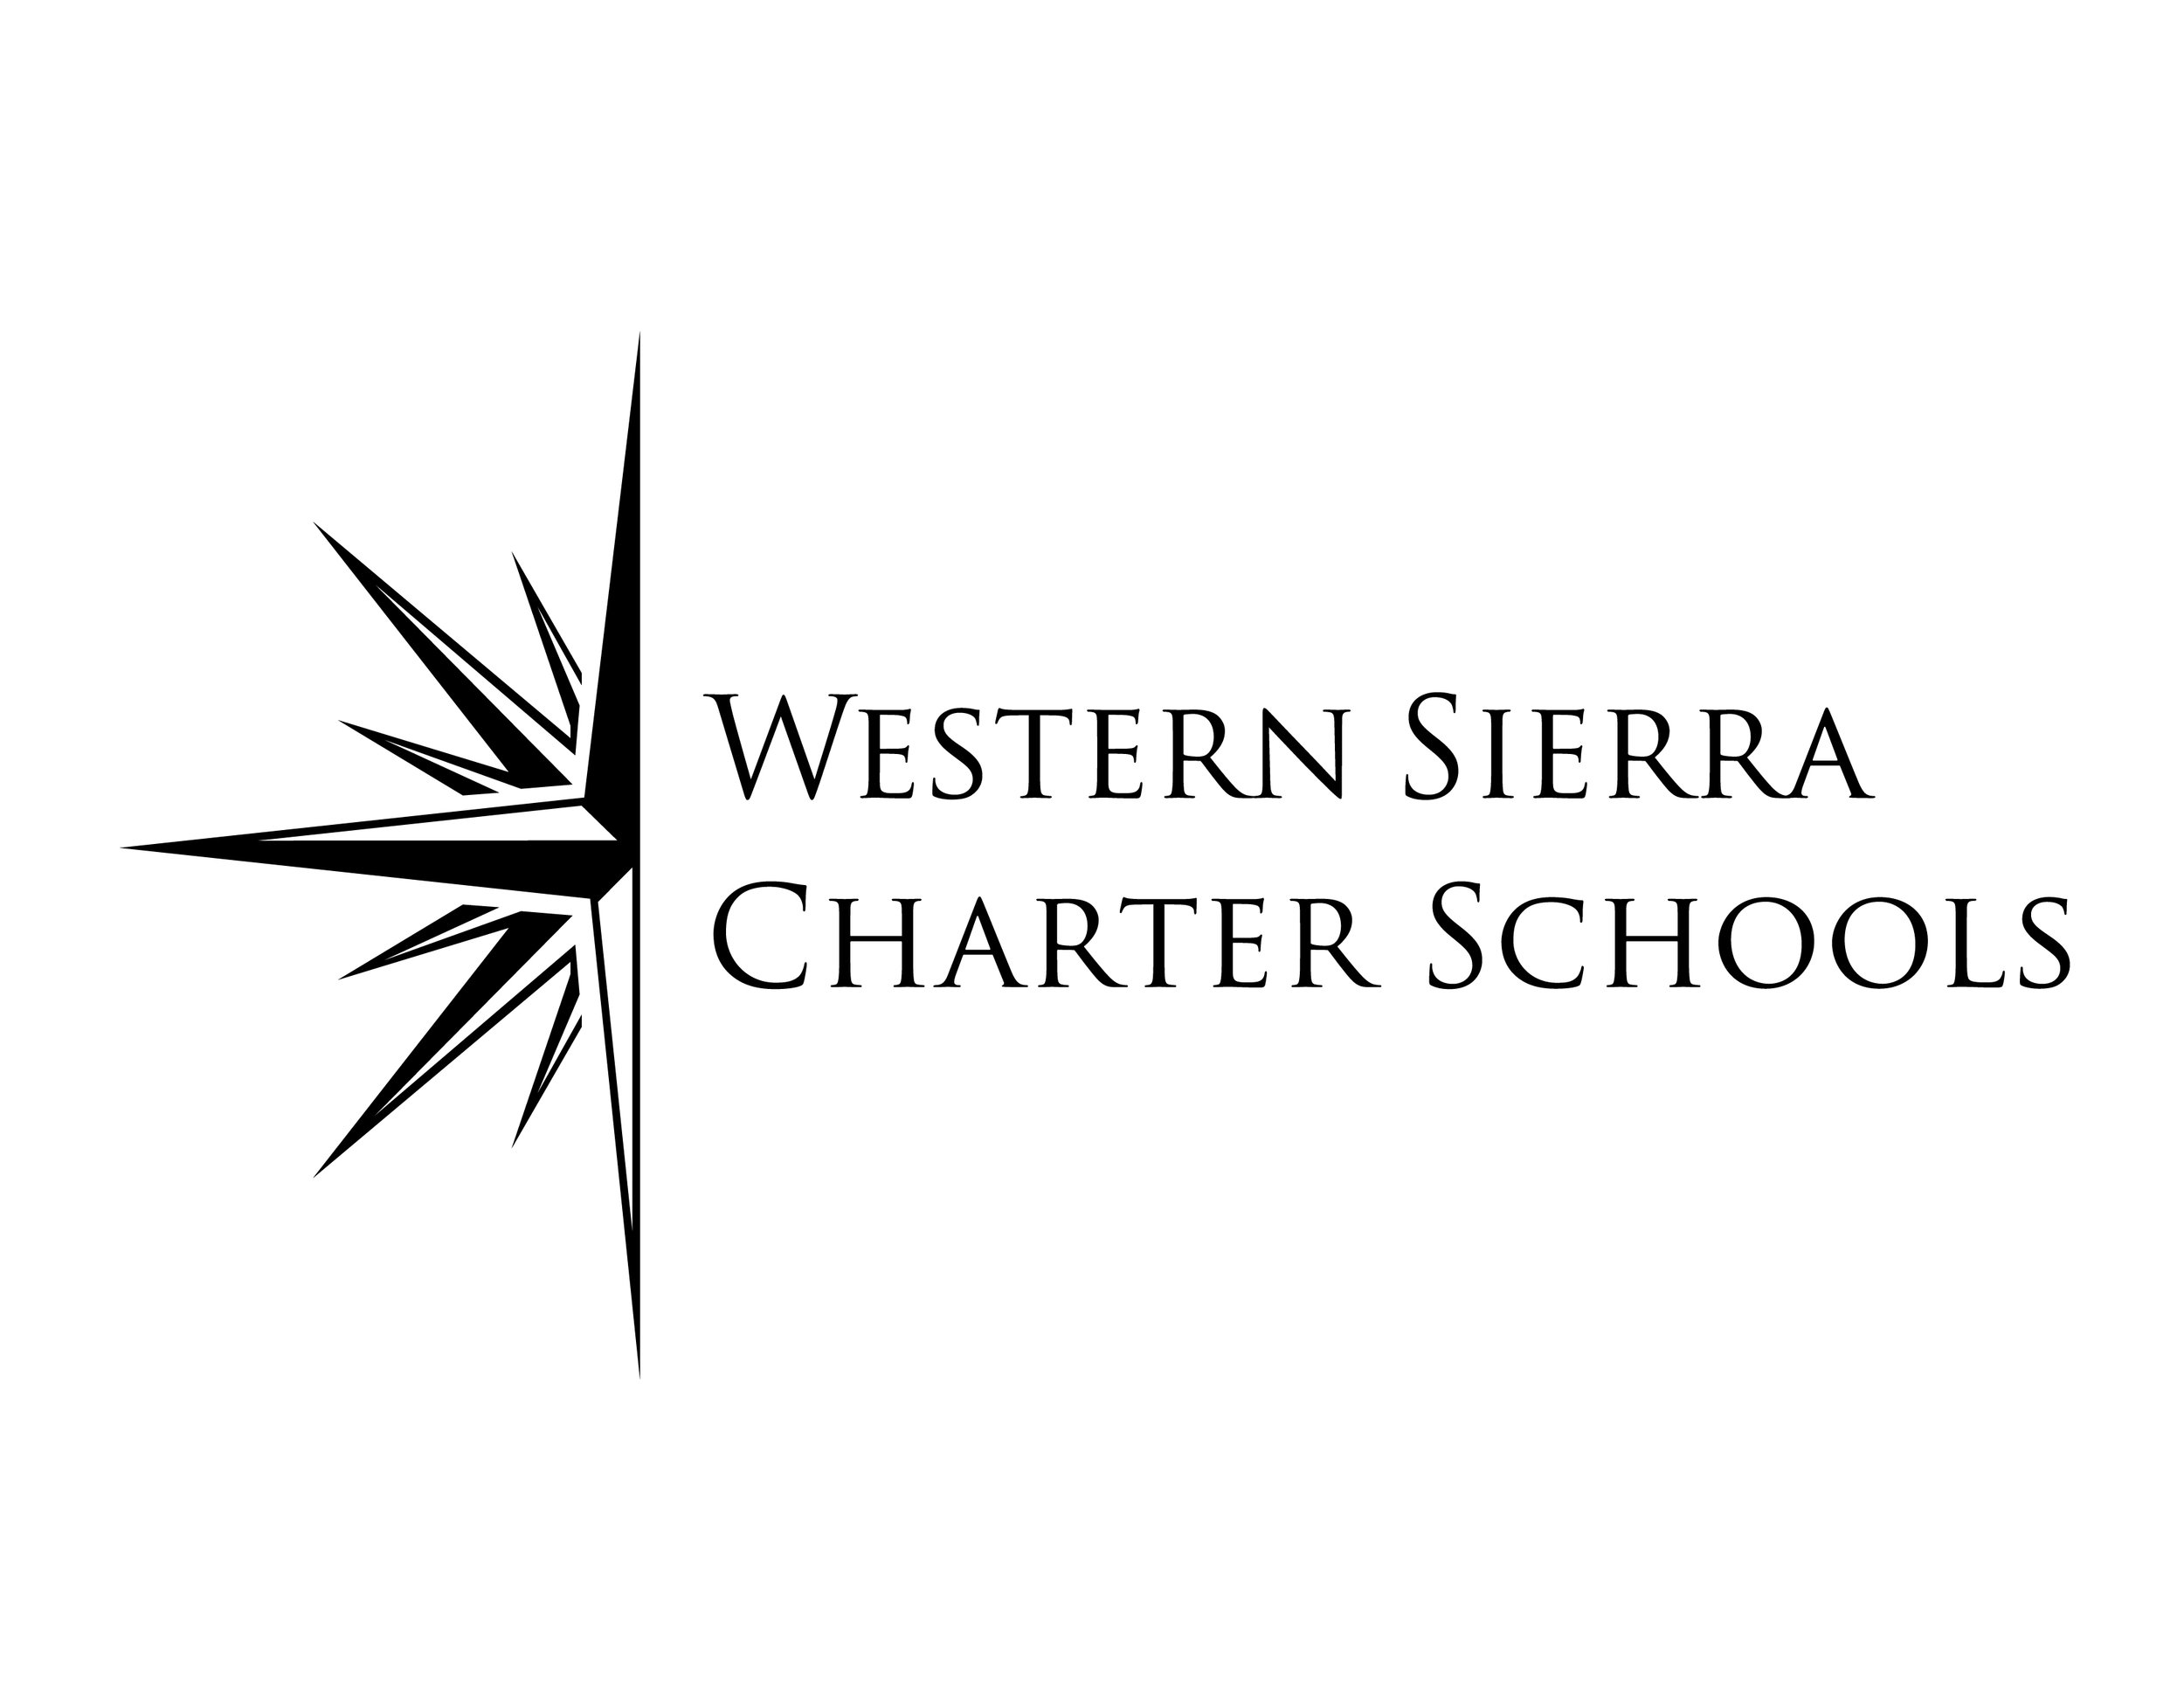 WESTERN SIERRA CHARTER SCHOOLS - OAKHURST, FRESNO